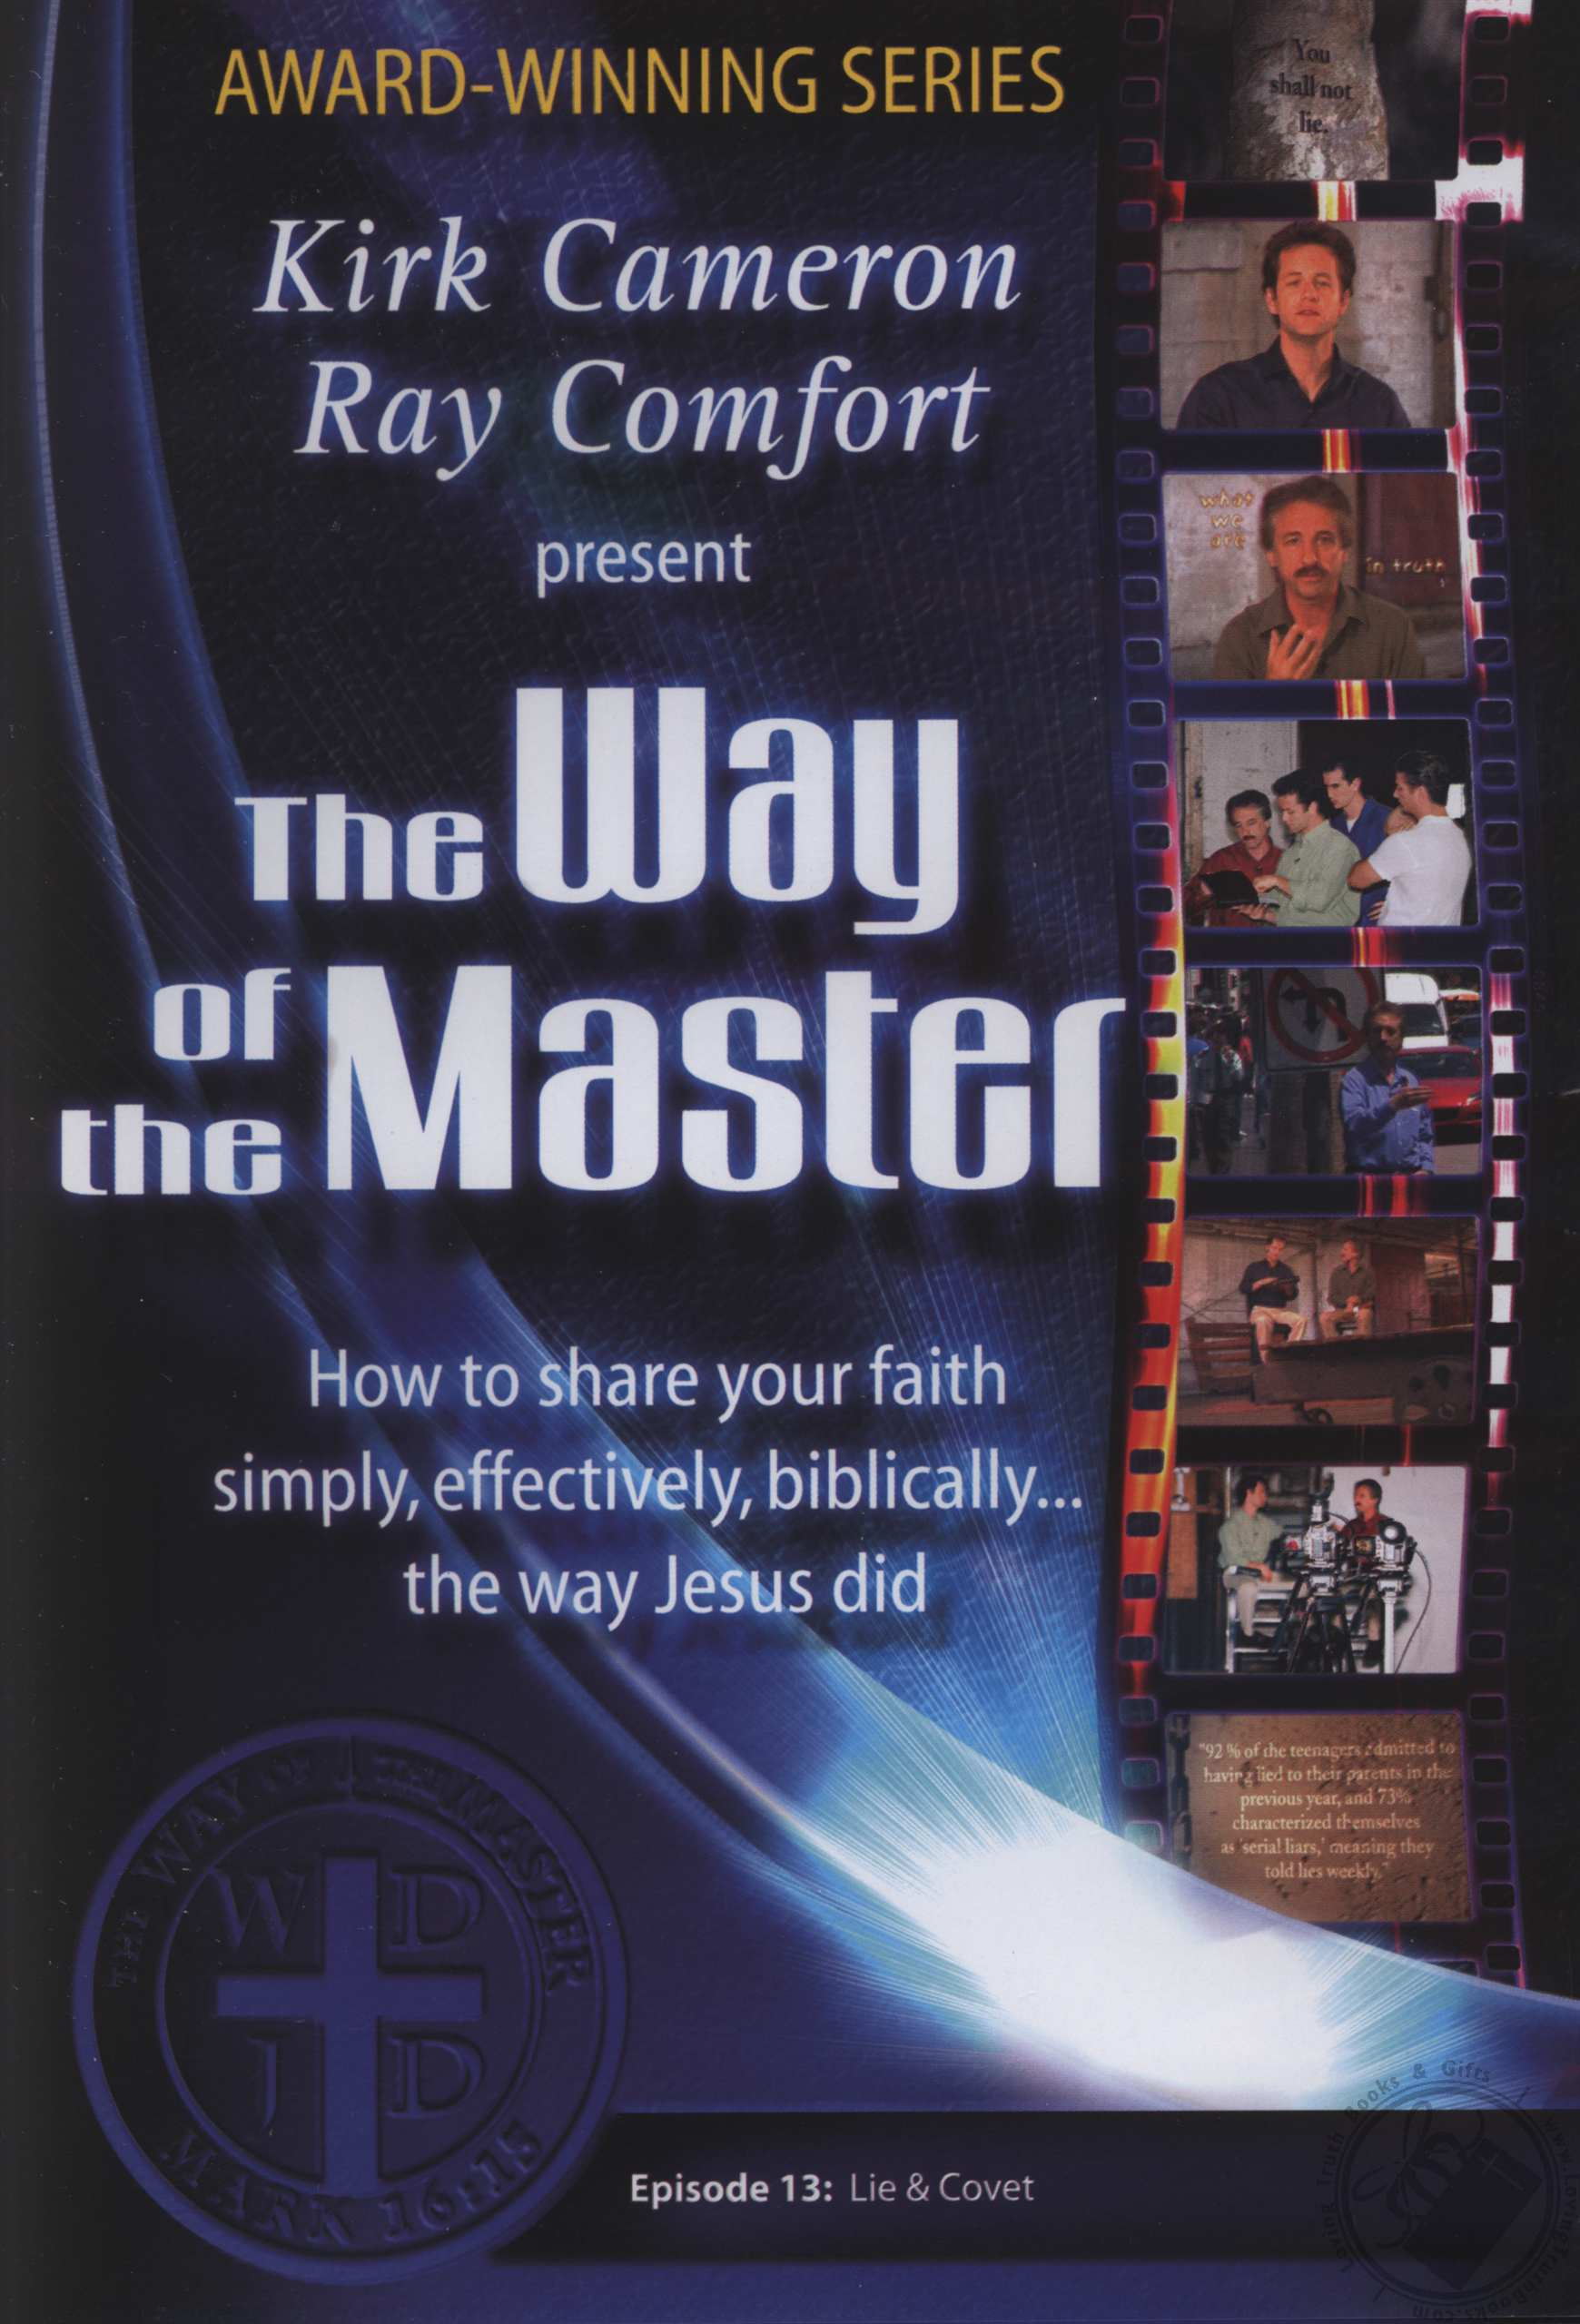 Set: Way of the Master Season 1 (7 DVD Set) by Ray Comfort